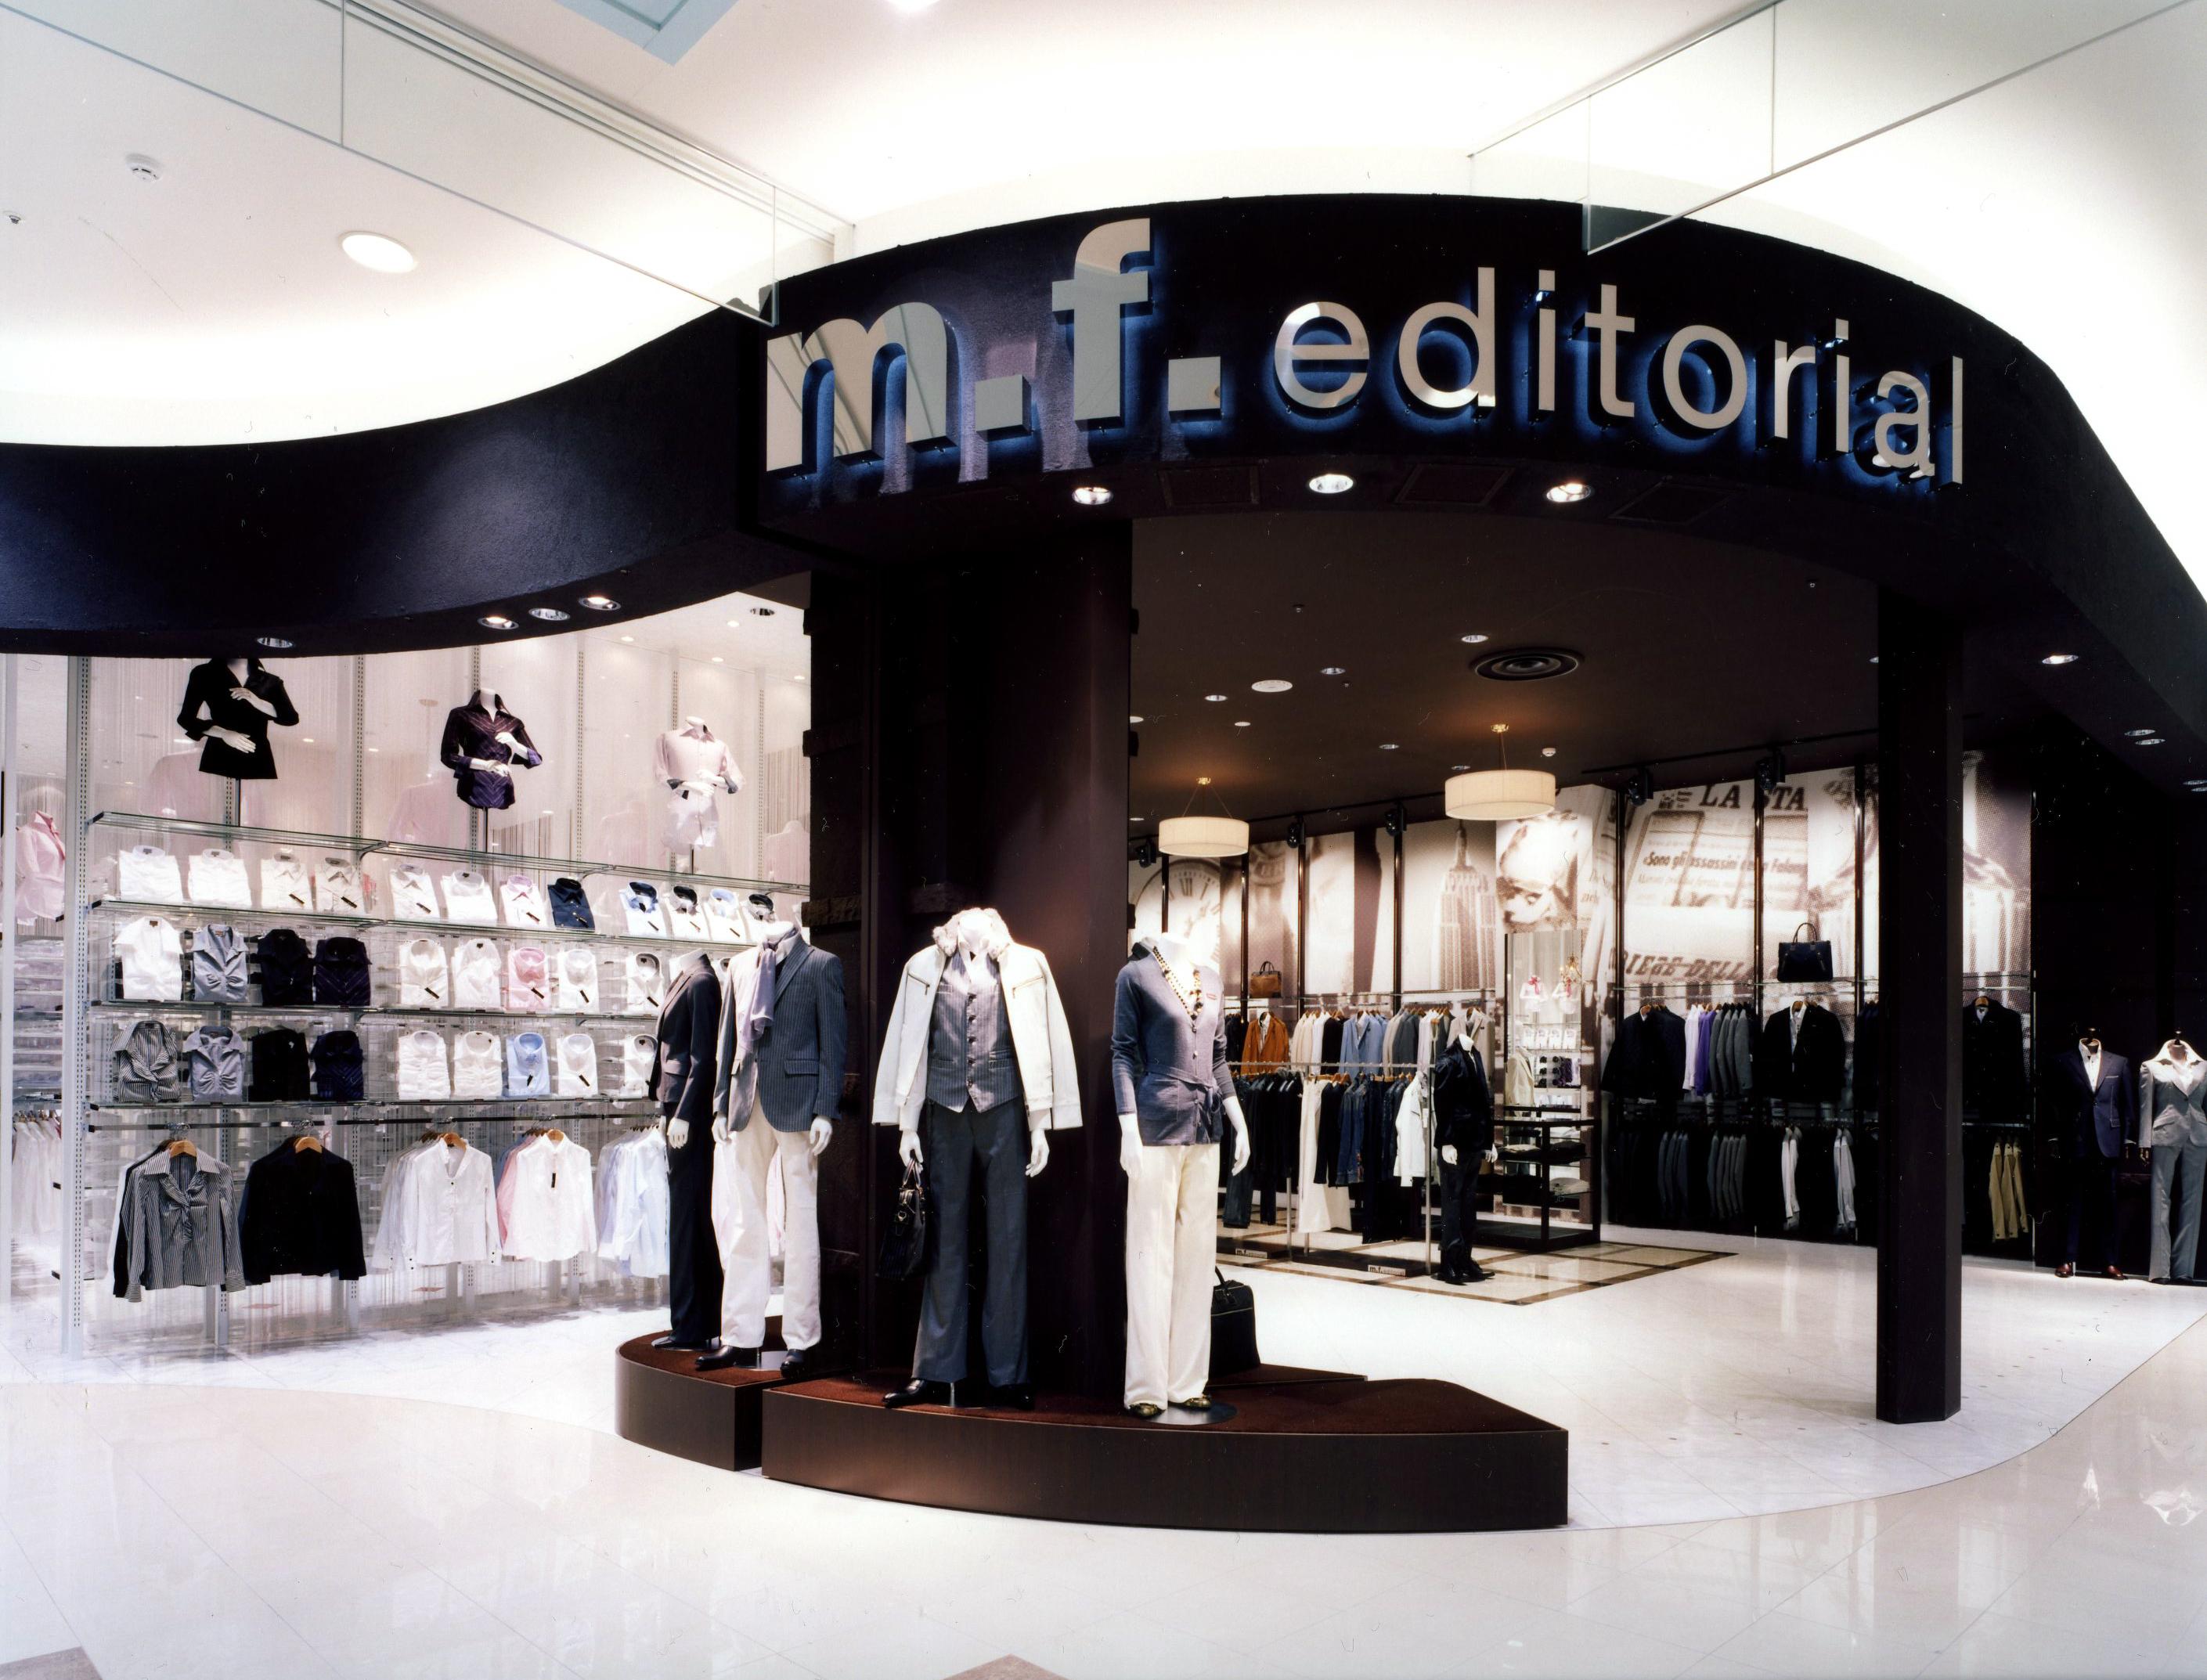 m.f.editorial